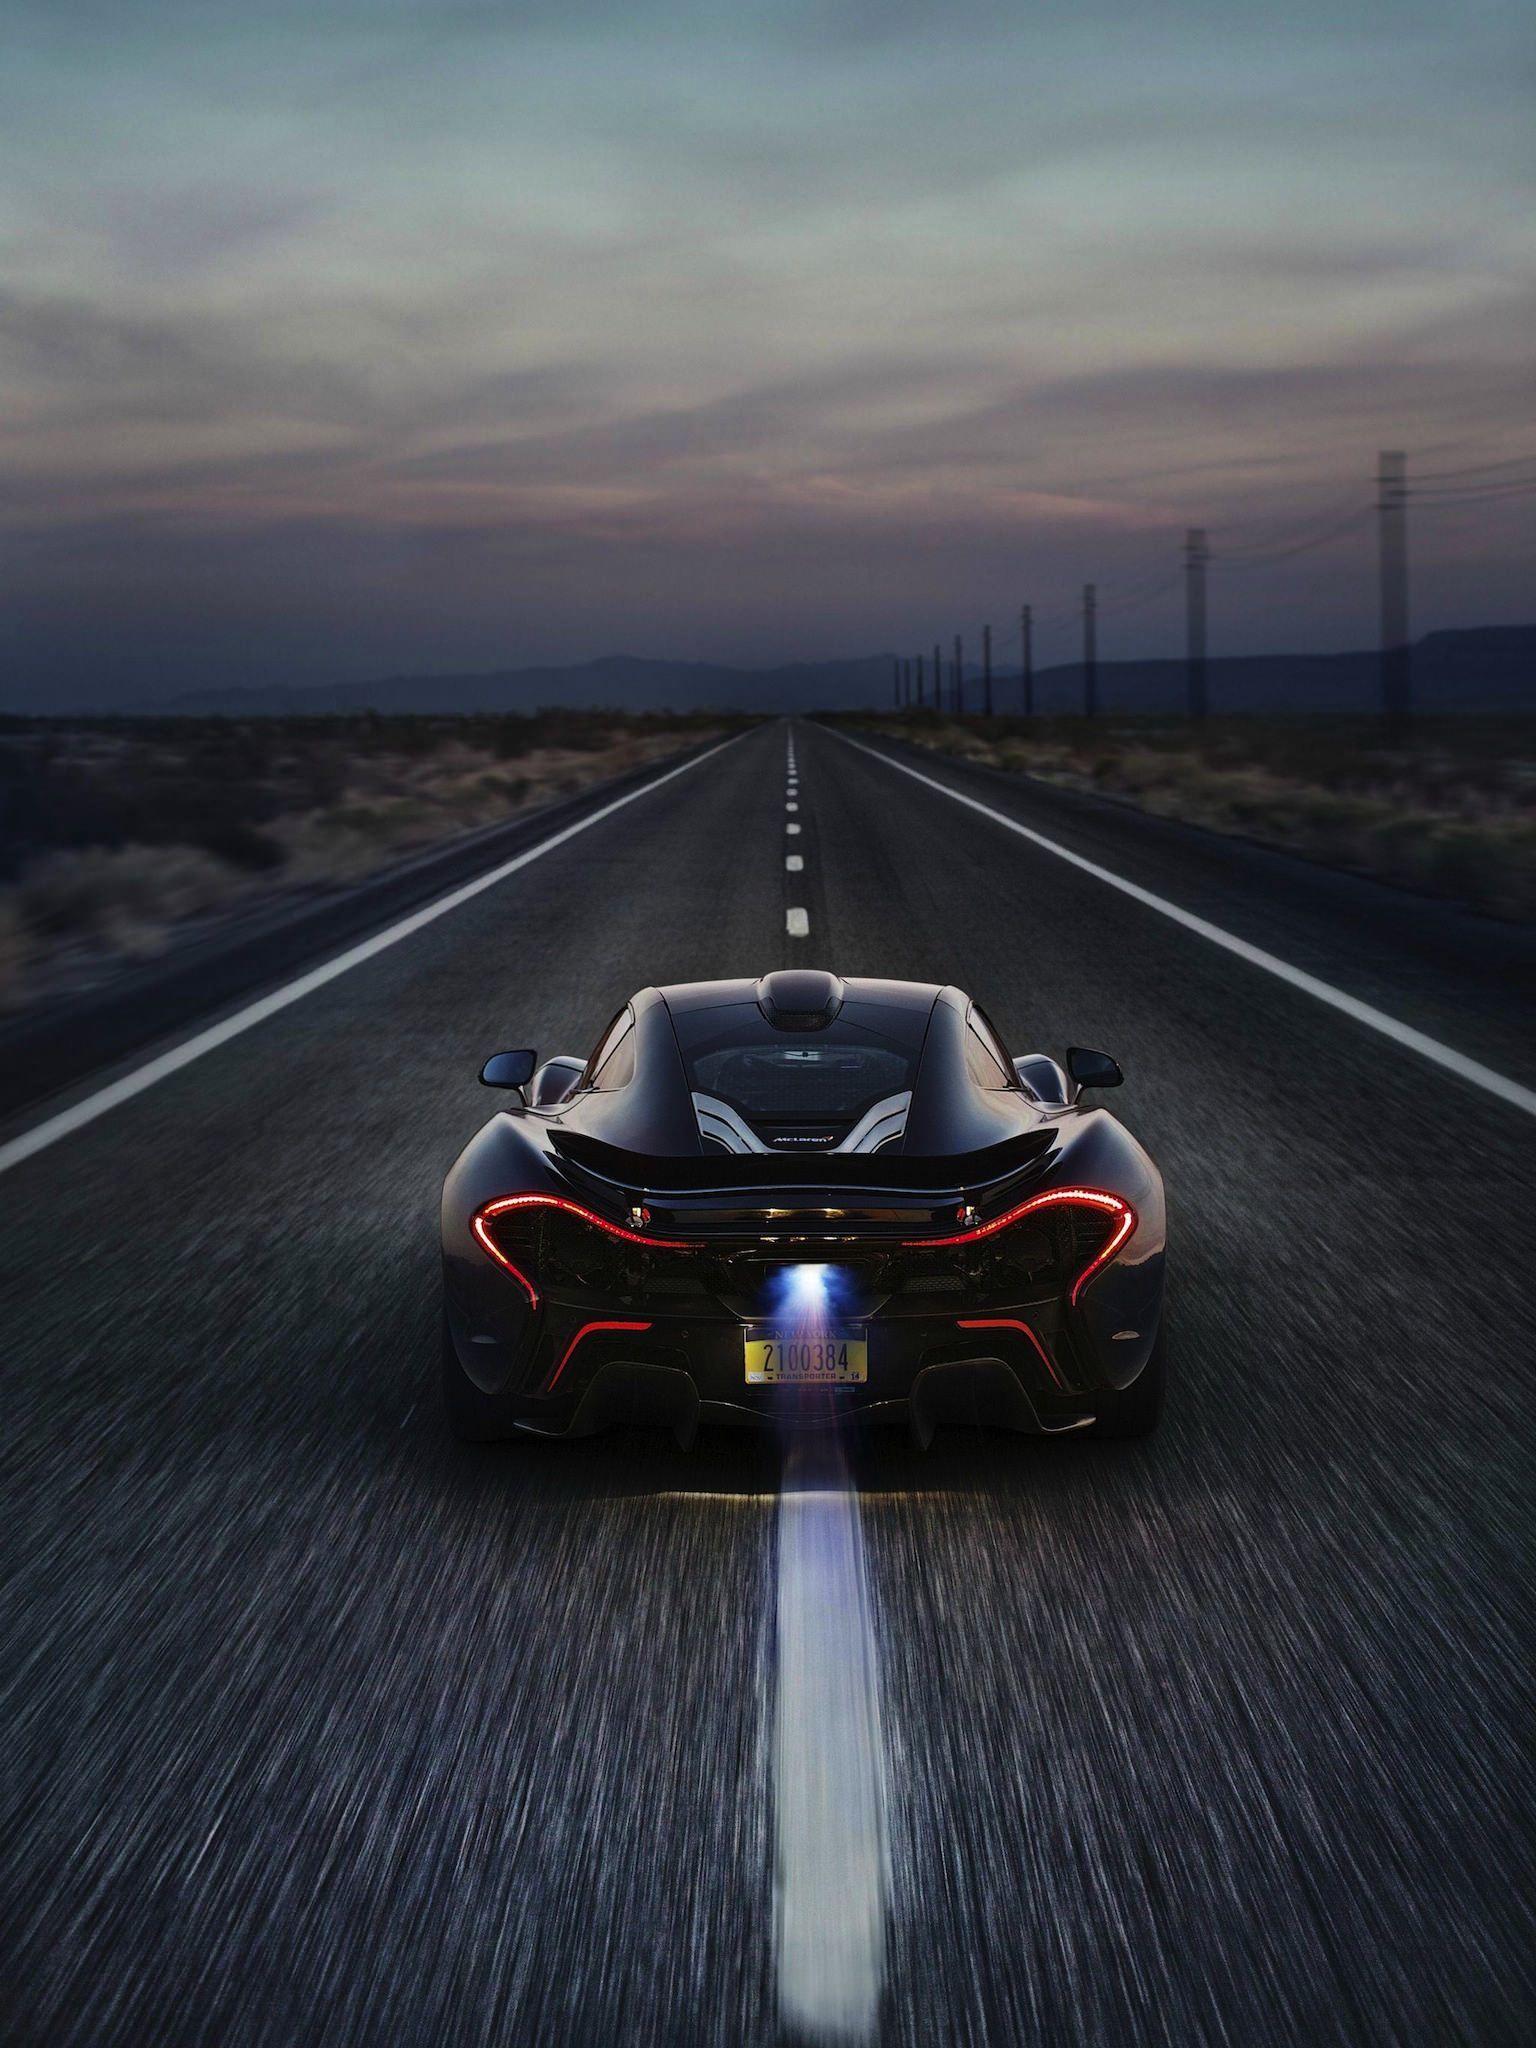 McLaren P1 iPhone & iPad Wallpaper Super cars, Mclaren